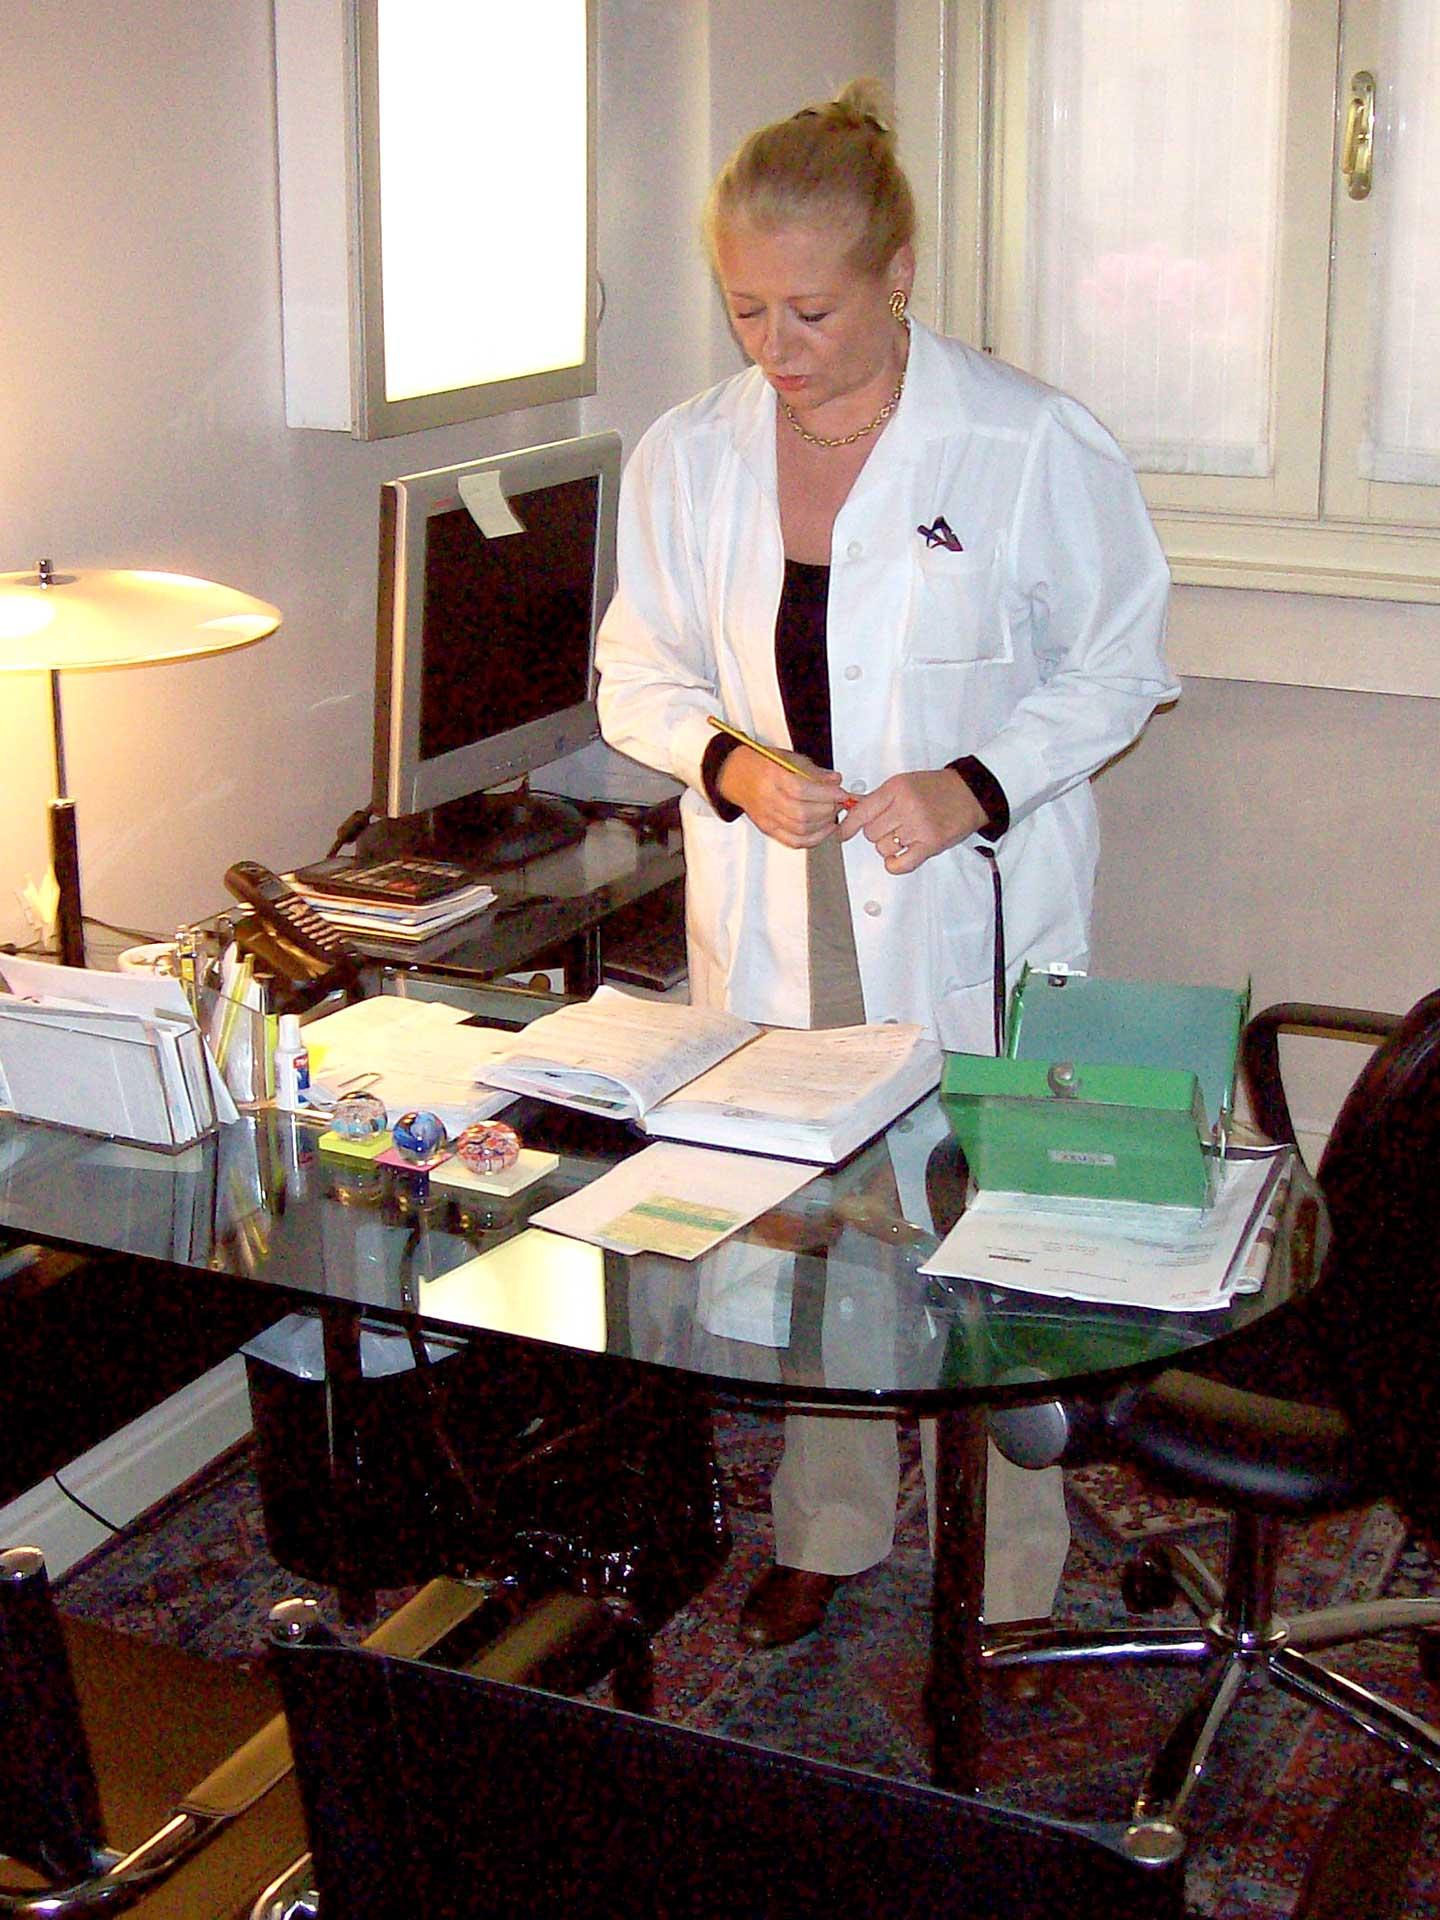 Studio Fisioterapia Rachele Raimondi